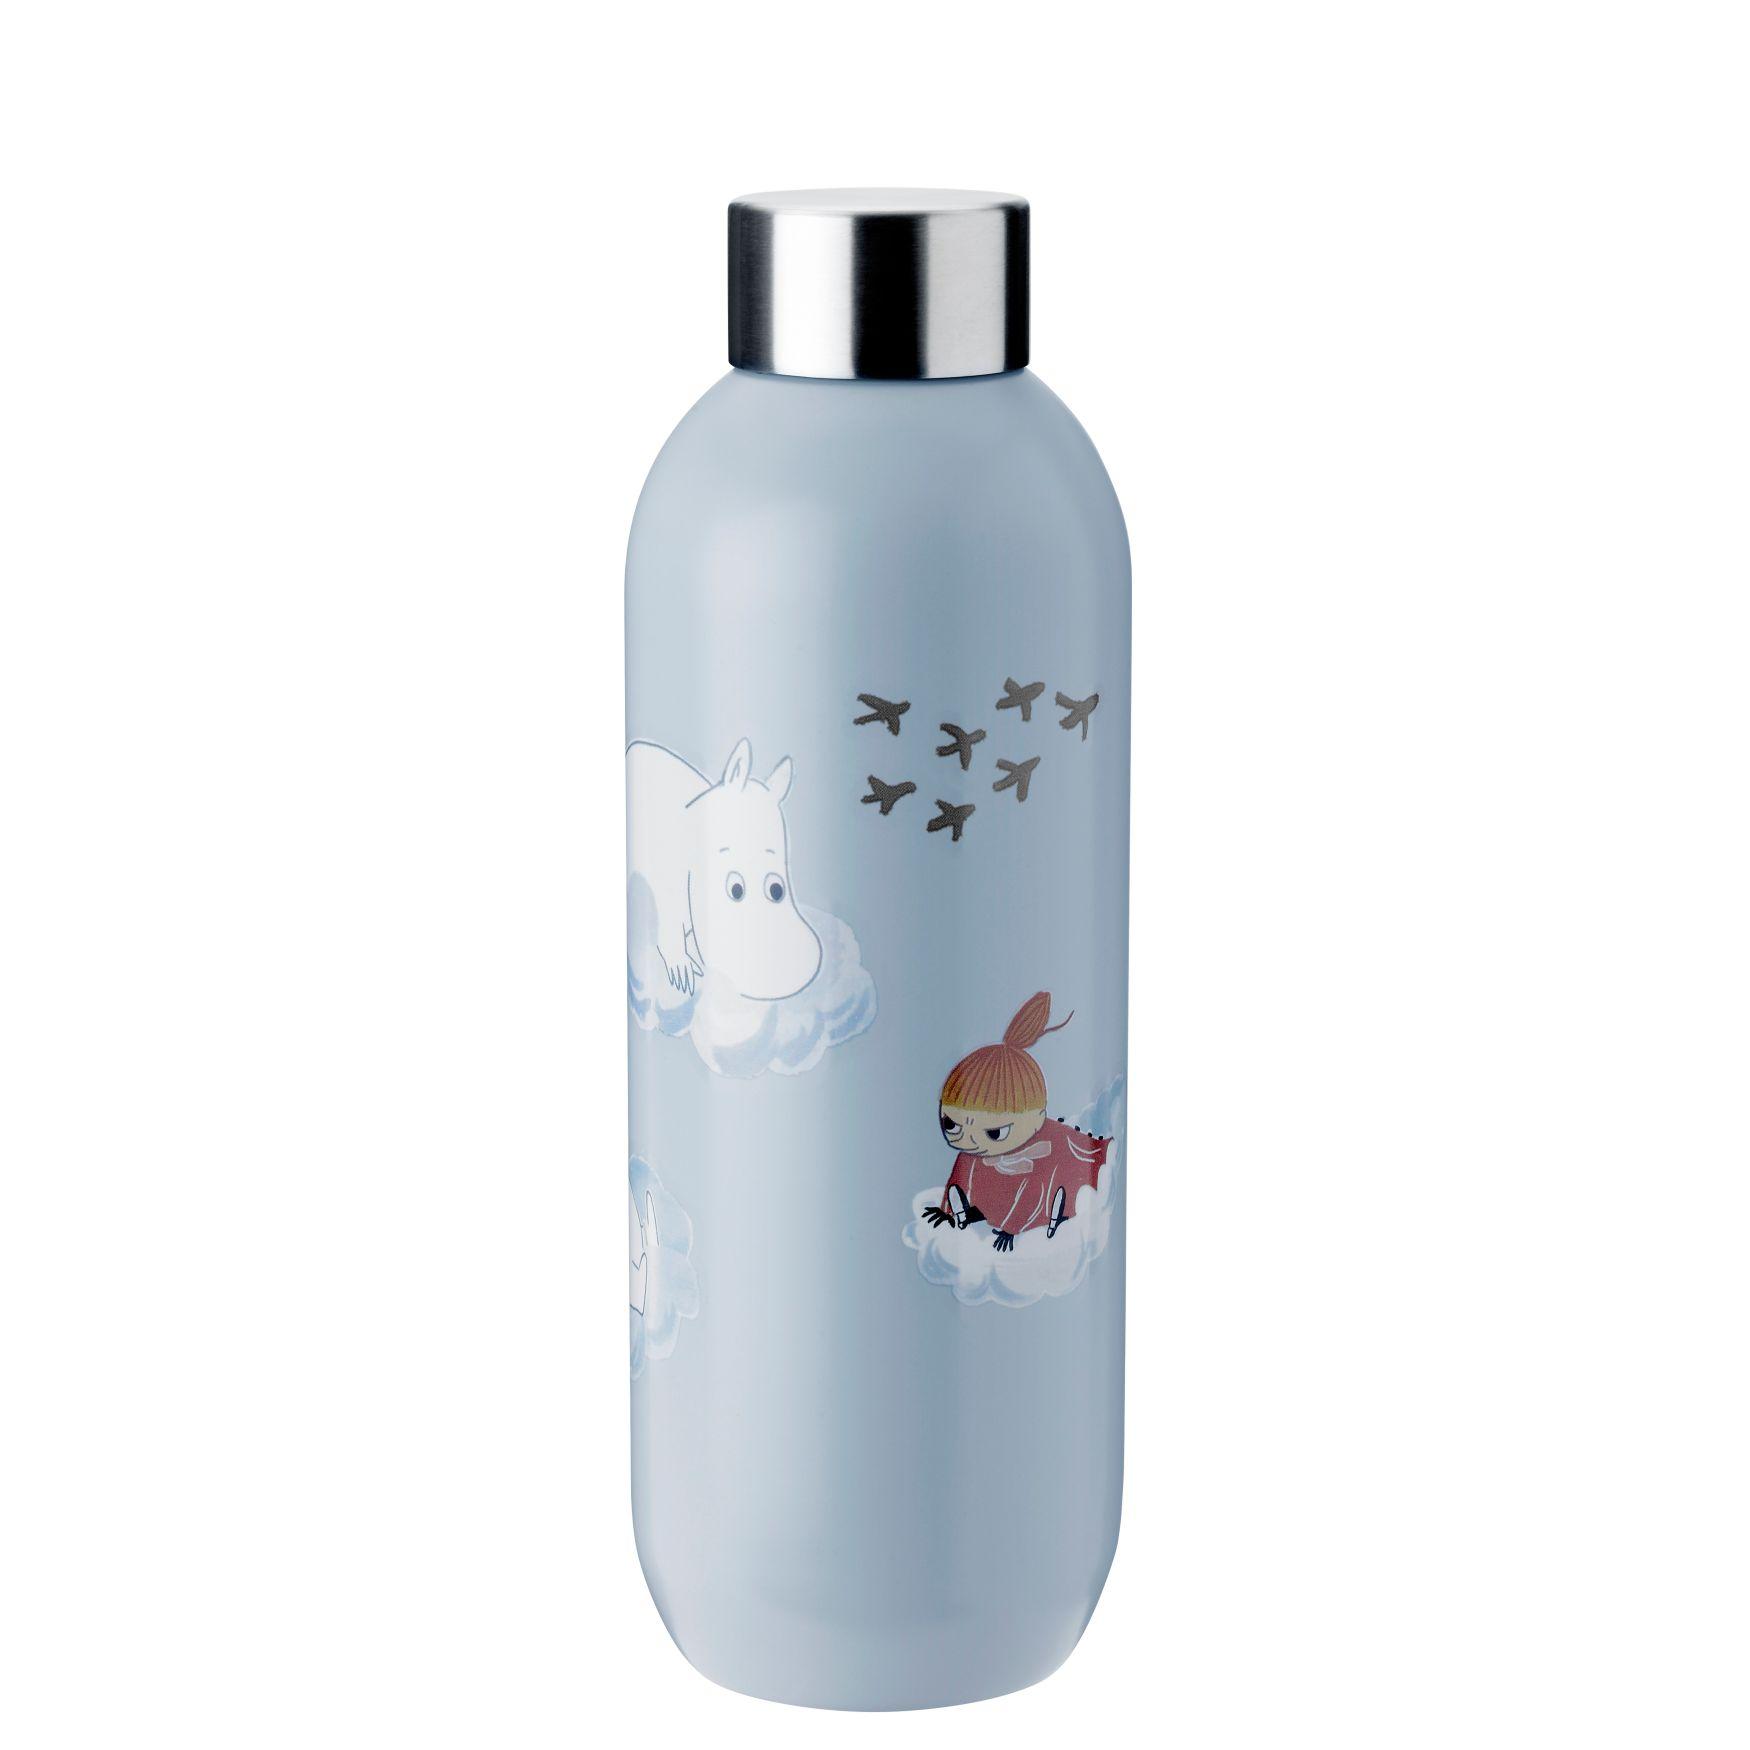 Stelton Keep Cool Mumi drikkeflaske, 750 ml, cloud